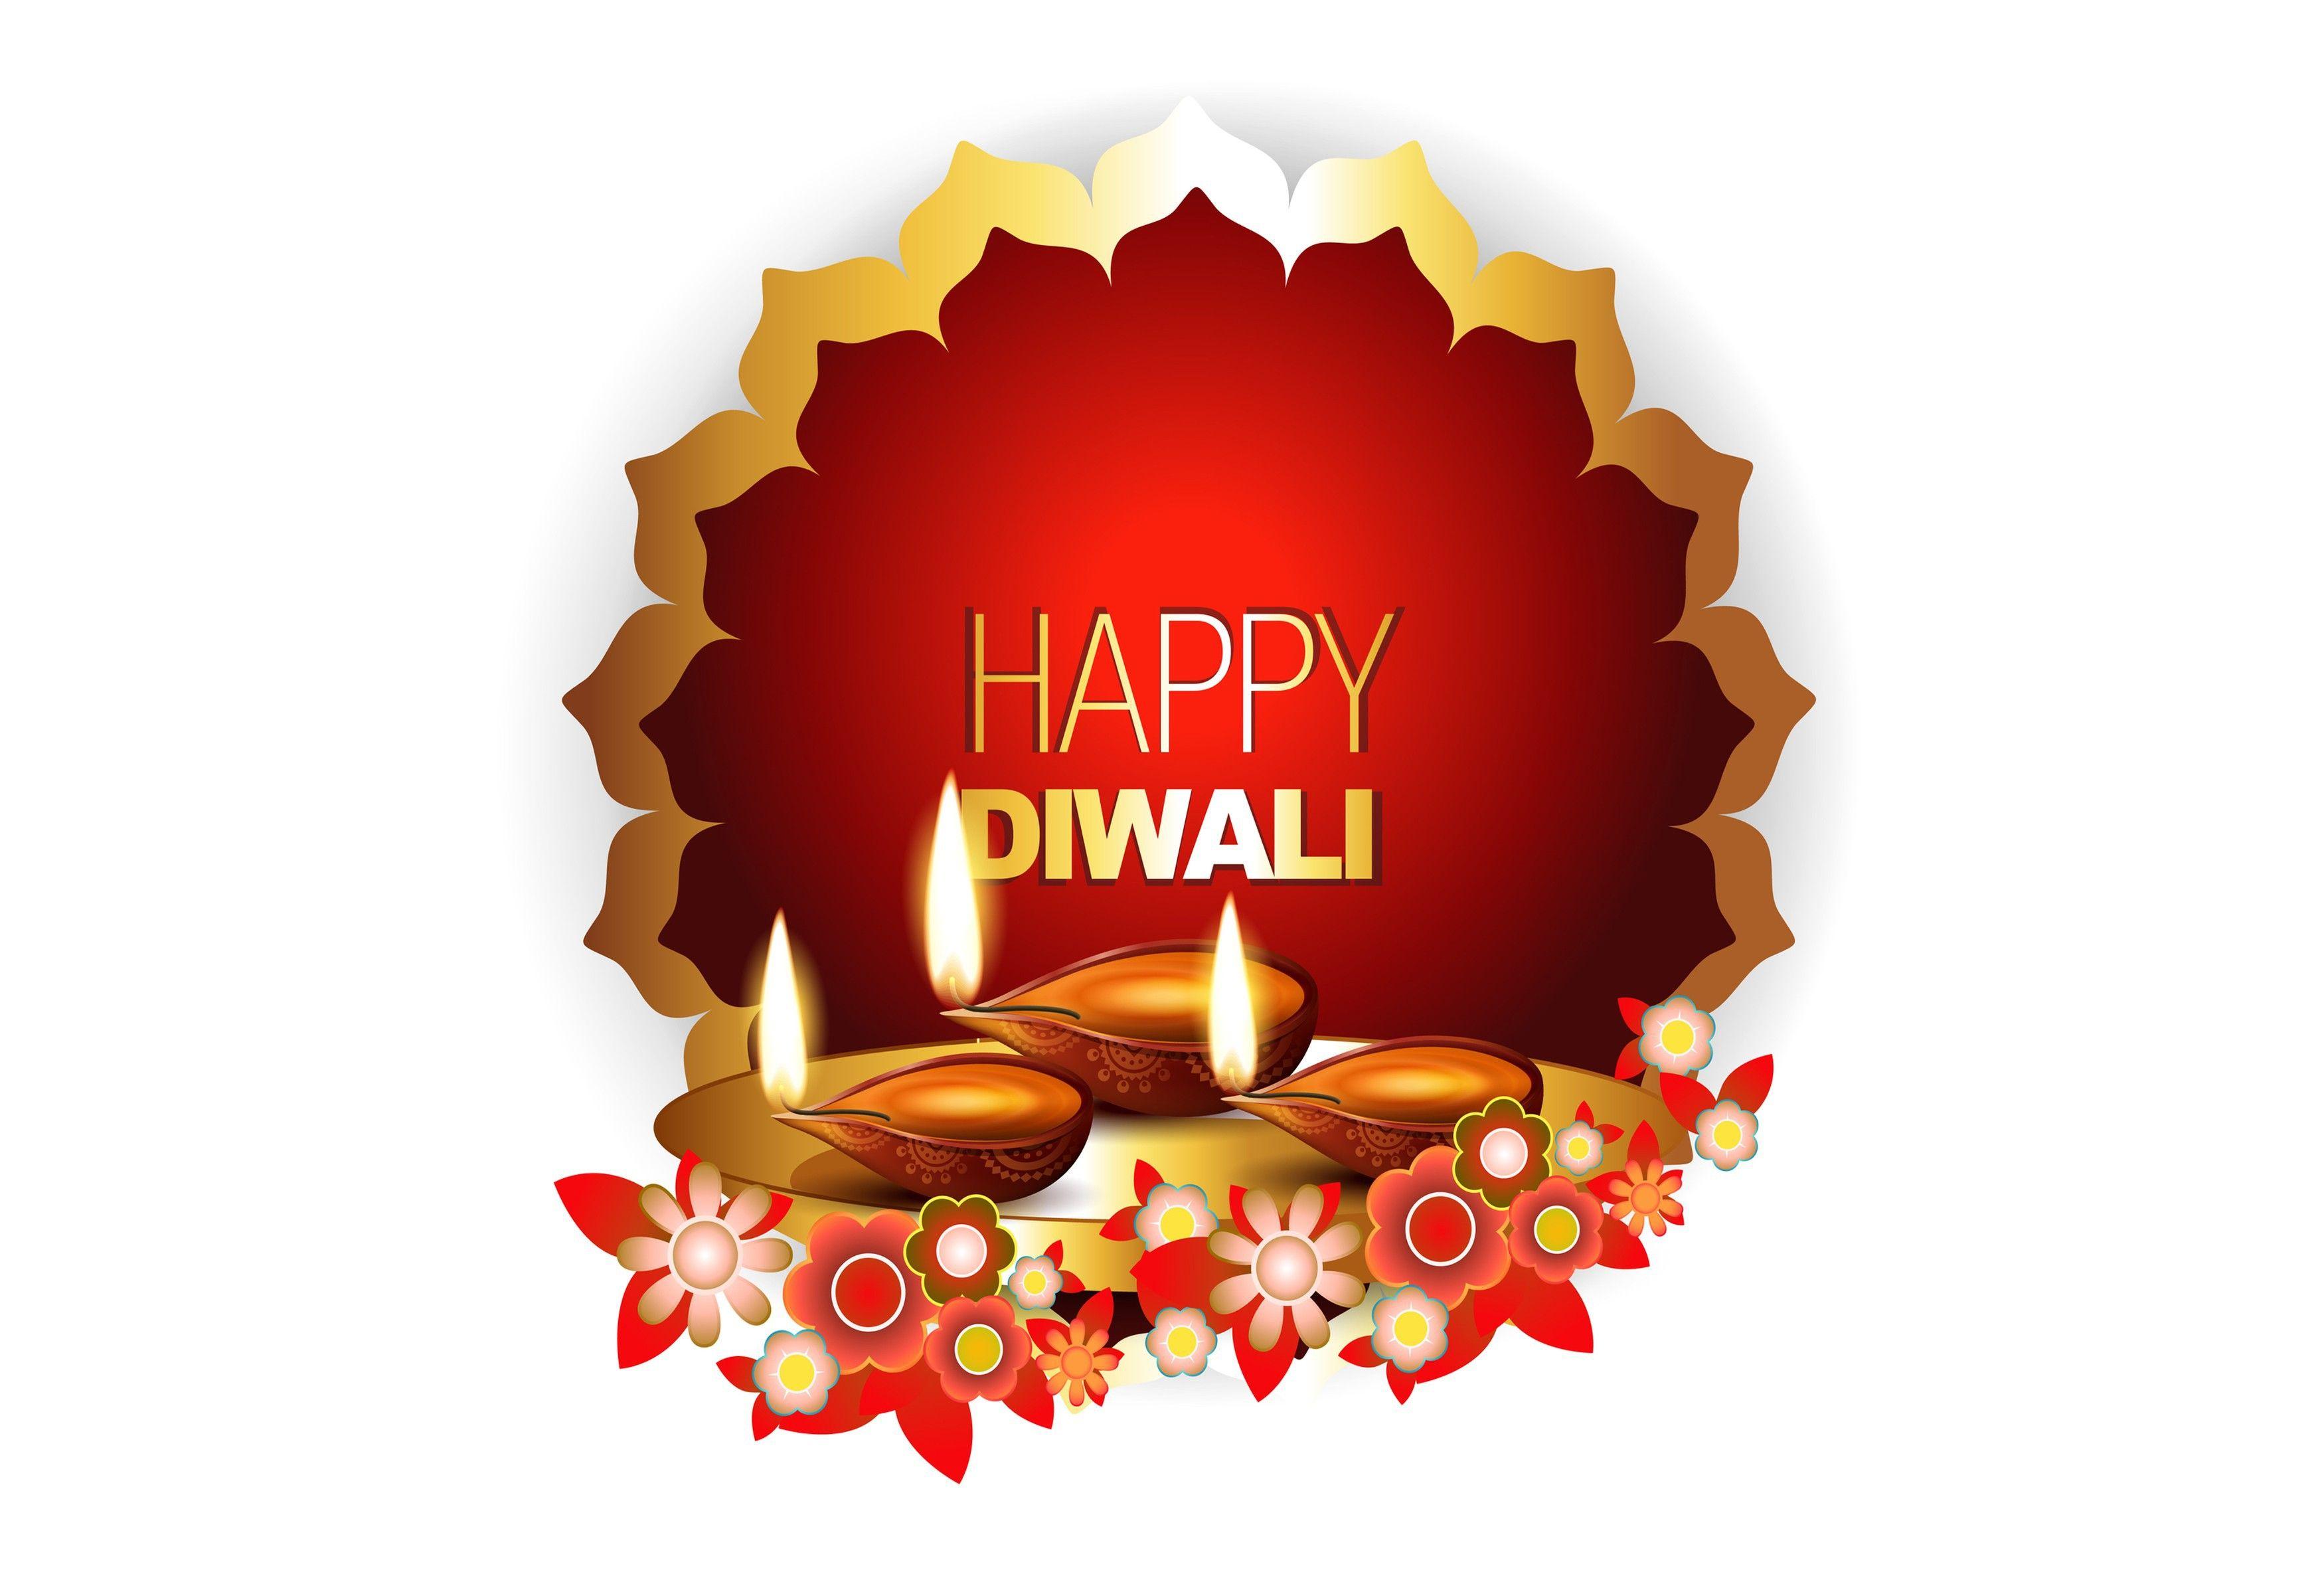 Pin By Sumeet Kaur On Frstivals Pinterest Happy Diwali Diwali